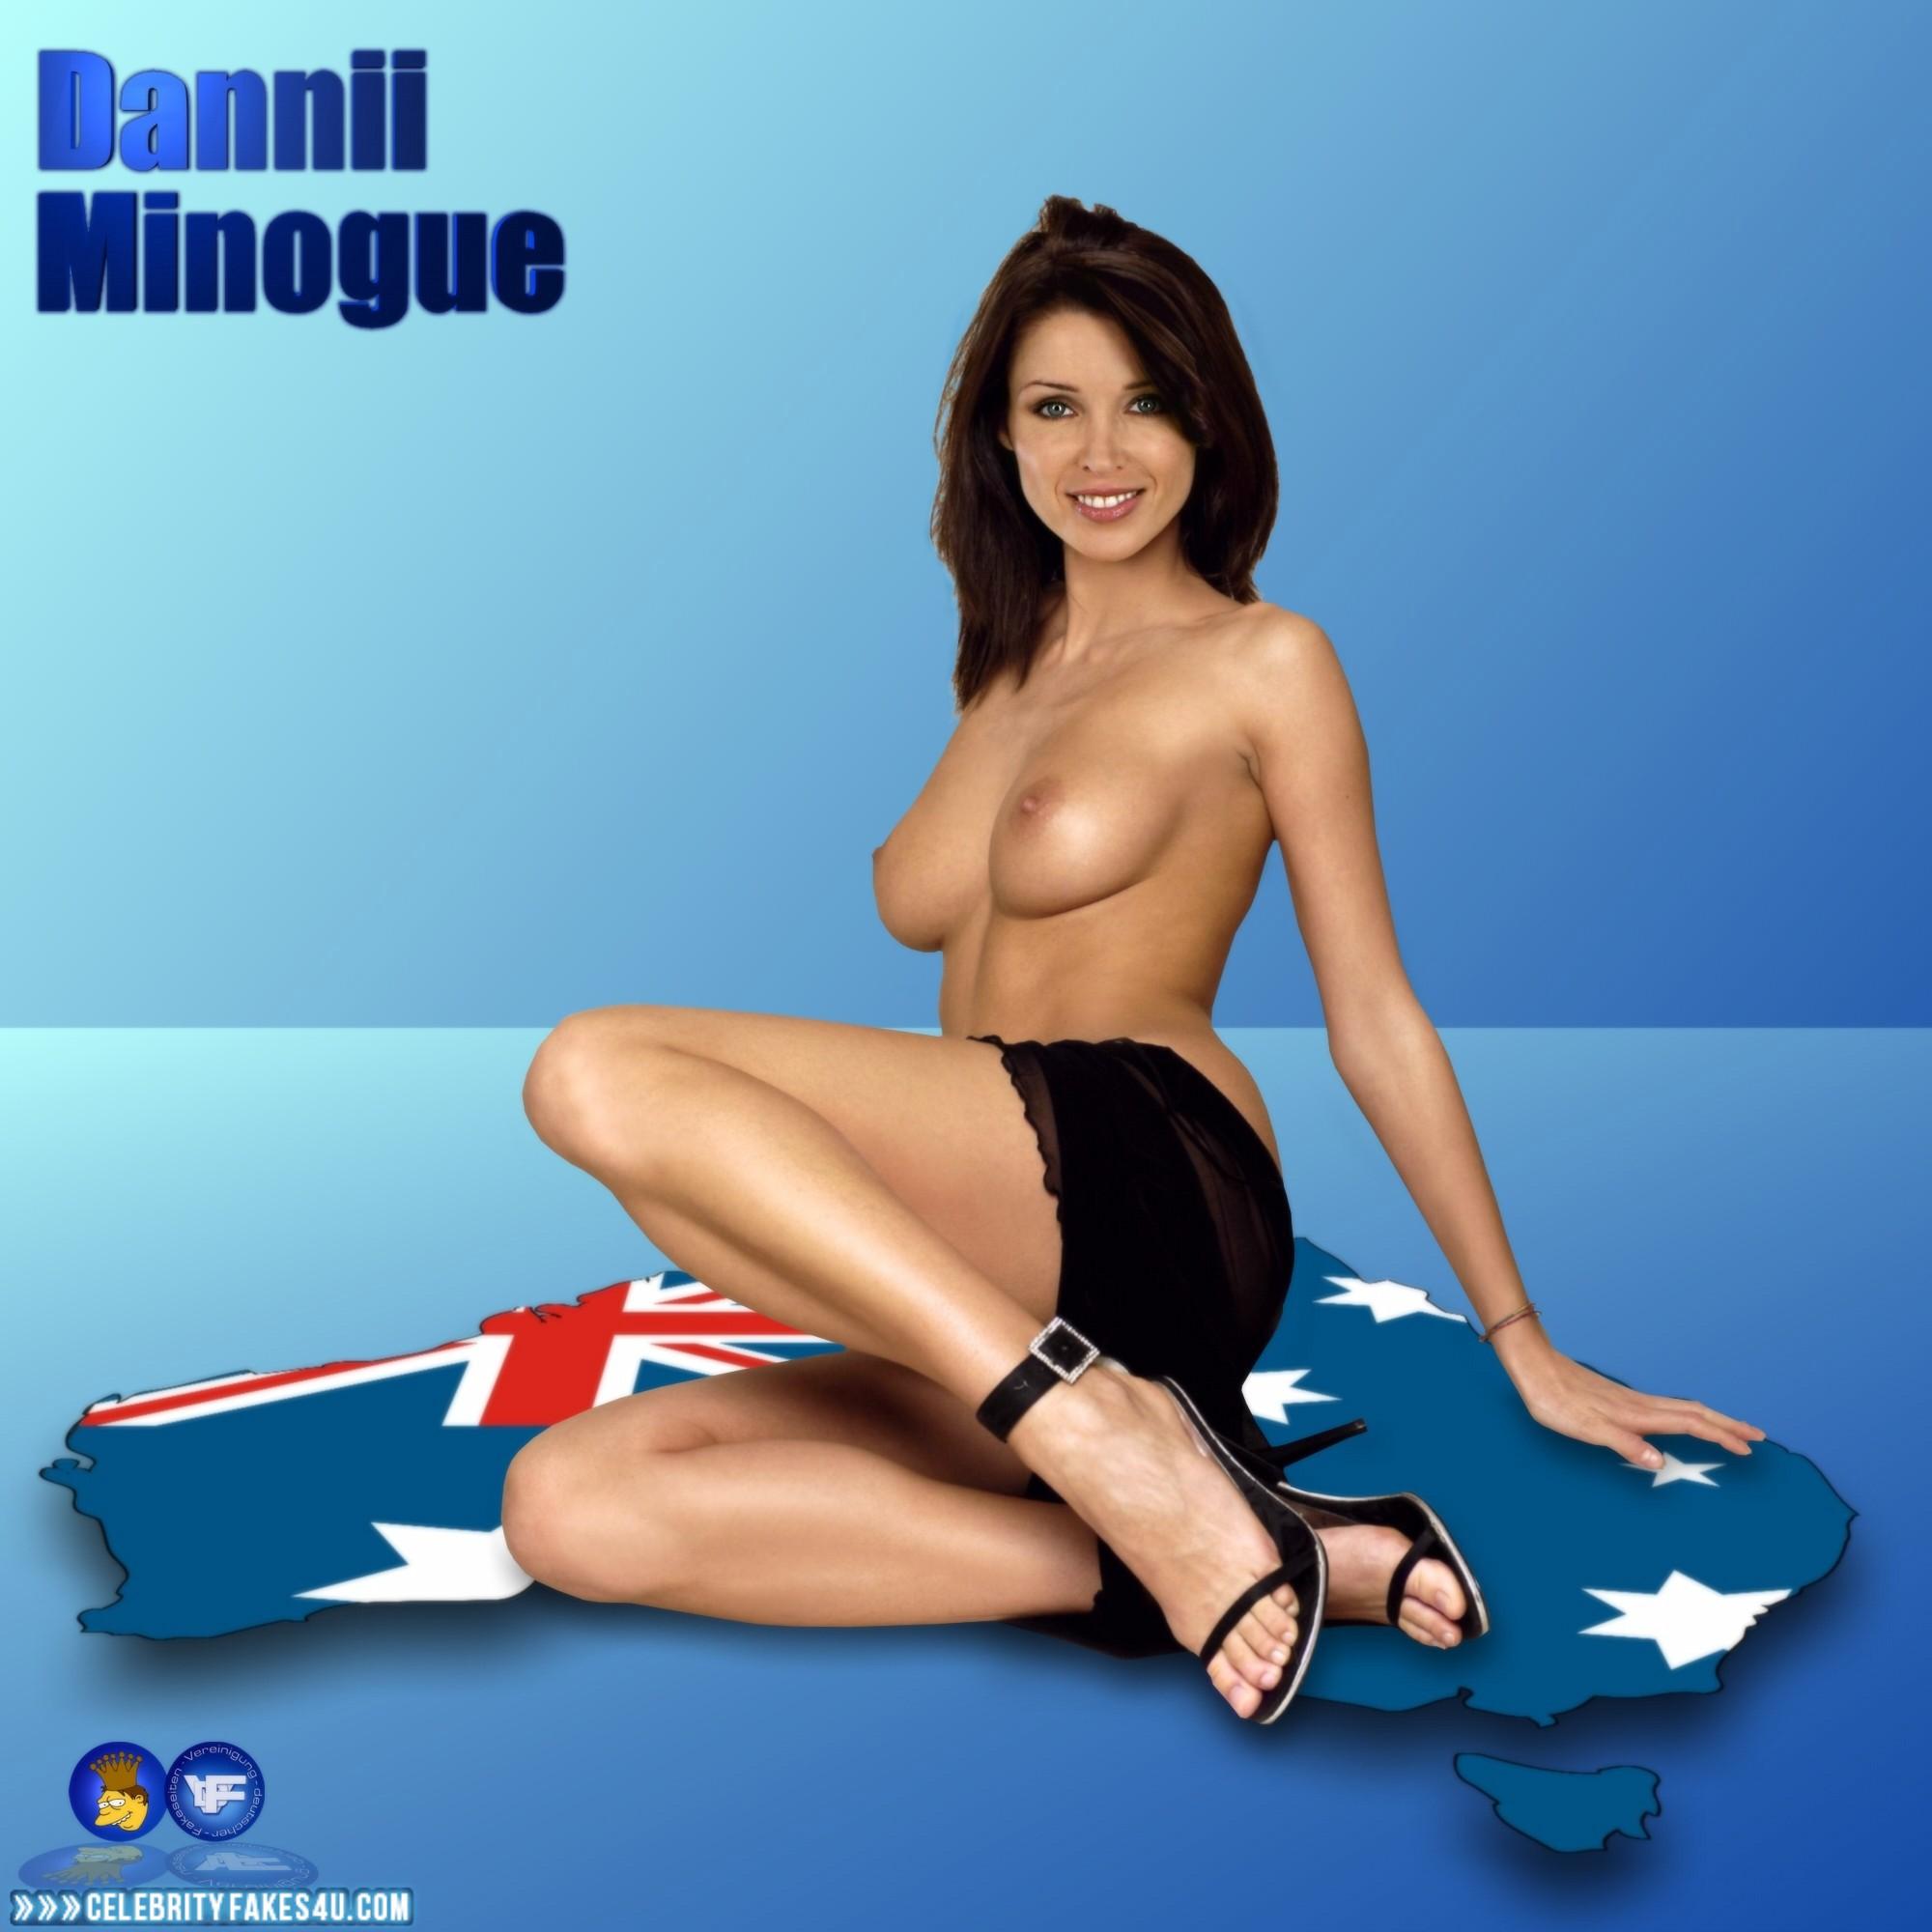 dannii-minogue-s-amazing-tits-girls-sex